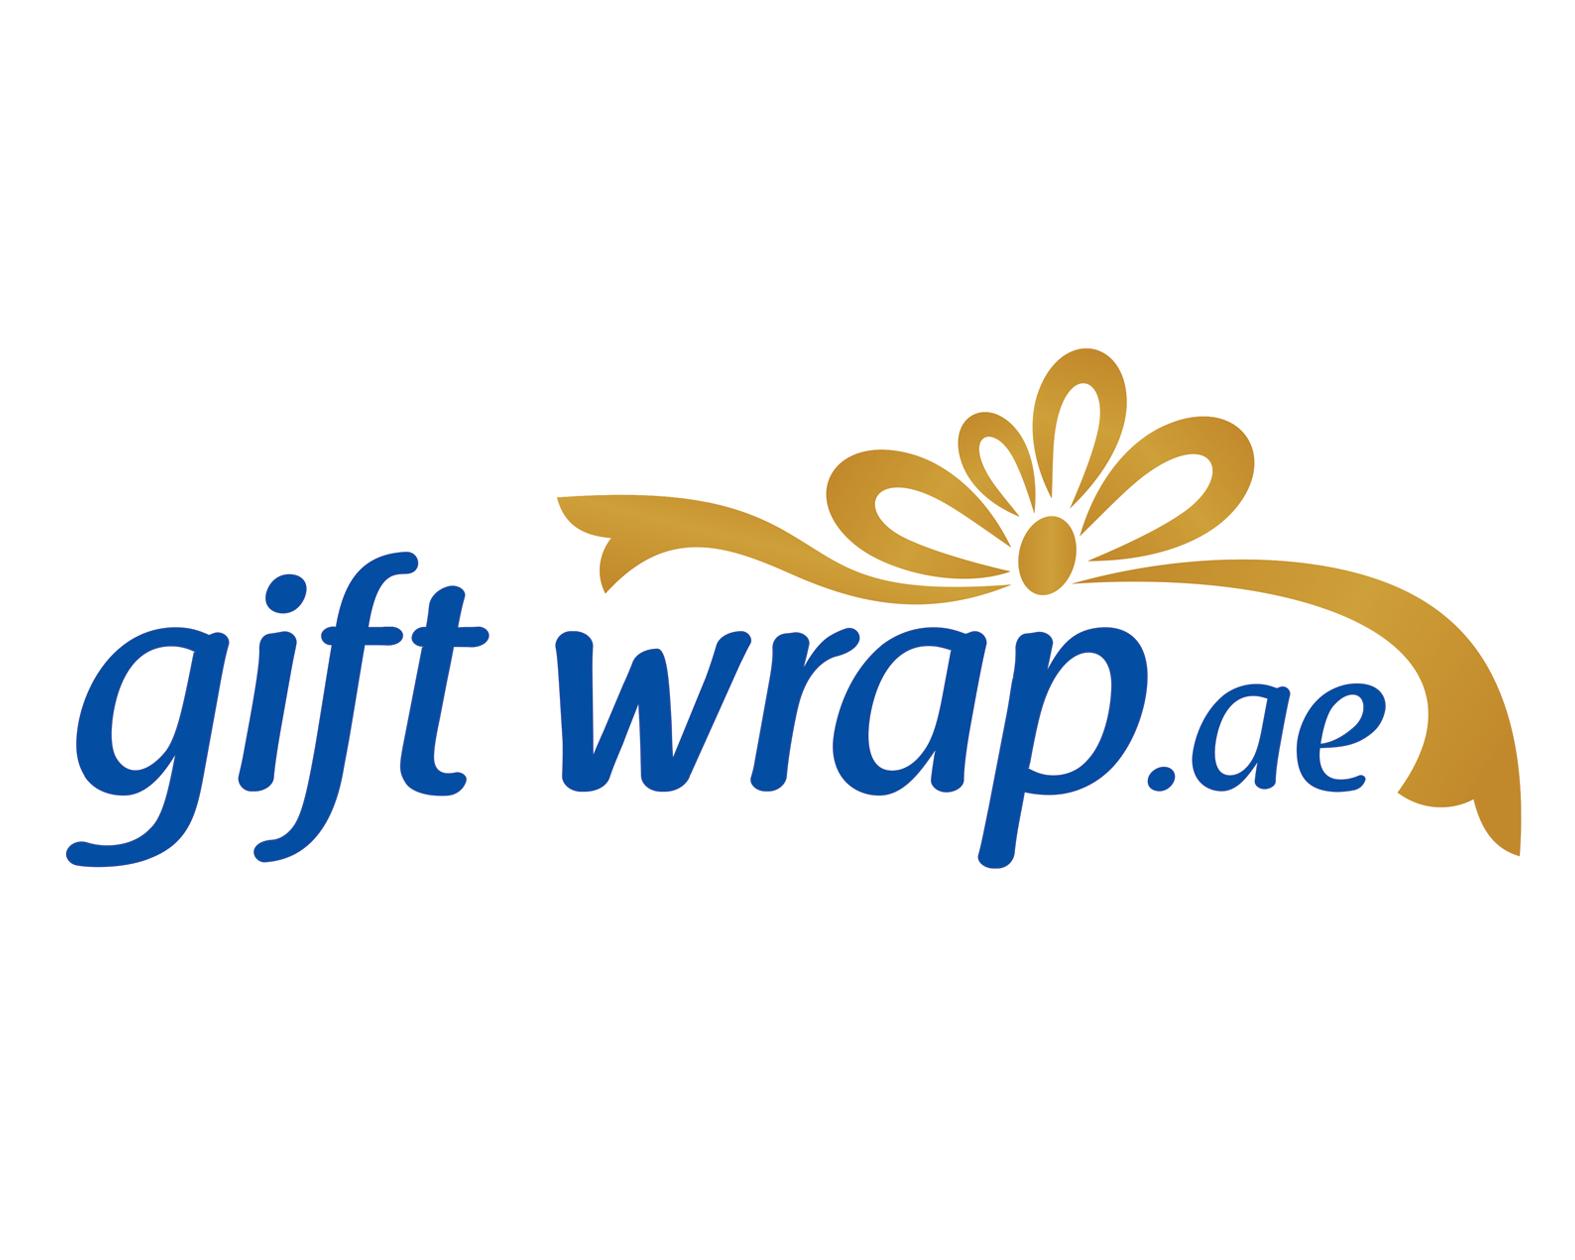 giftwrapae